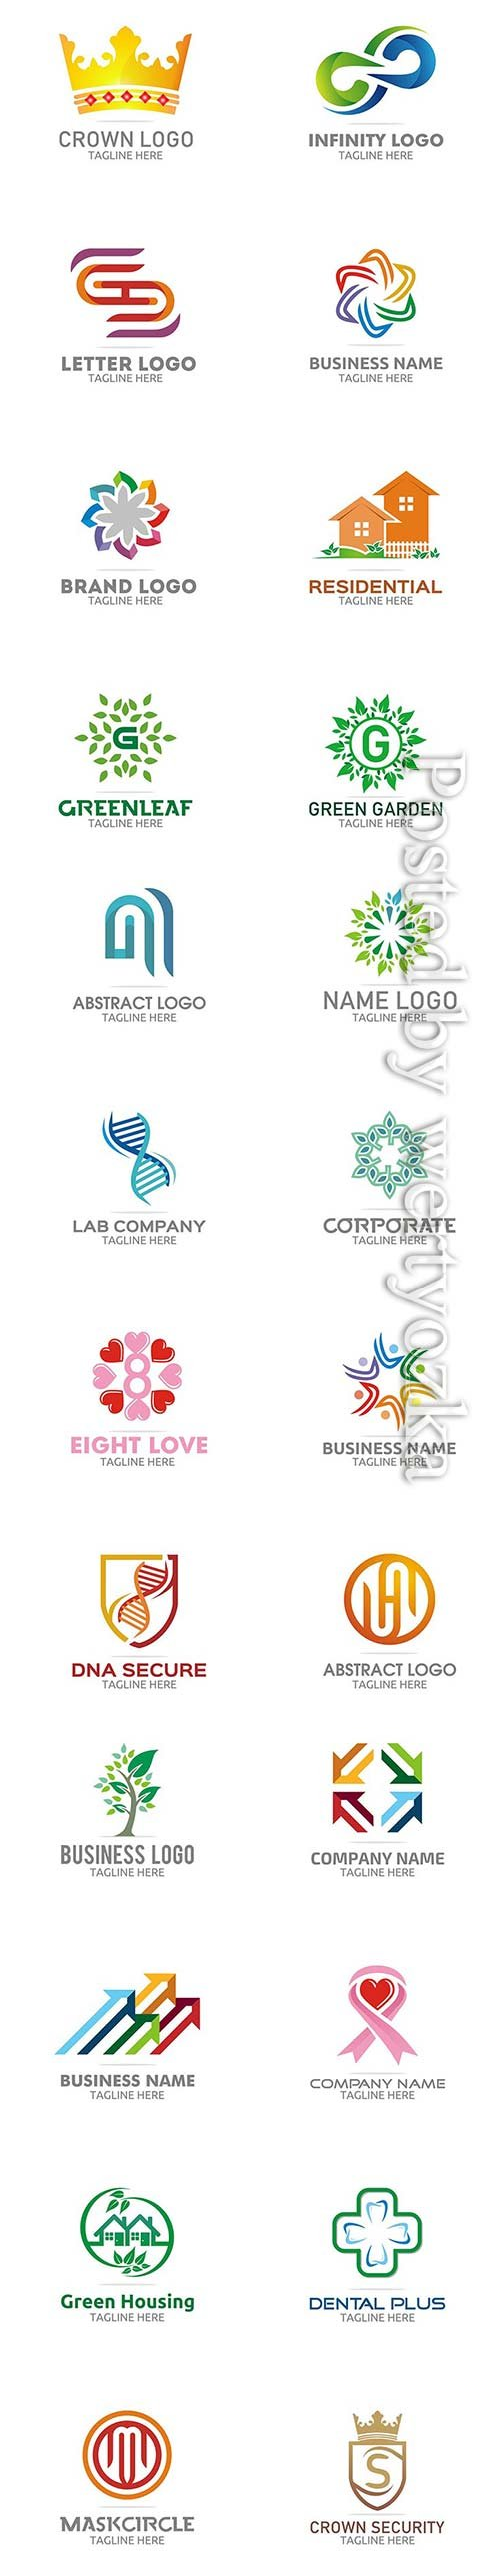 28 Modern Color Logo Designs